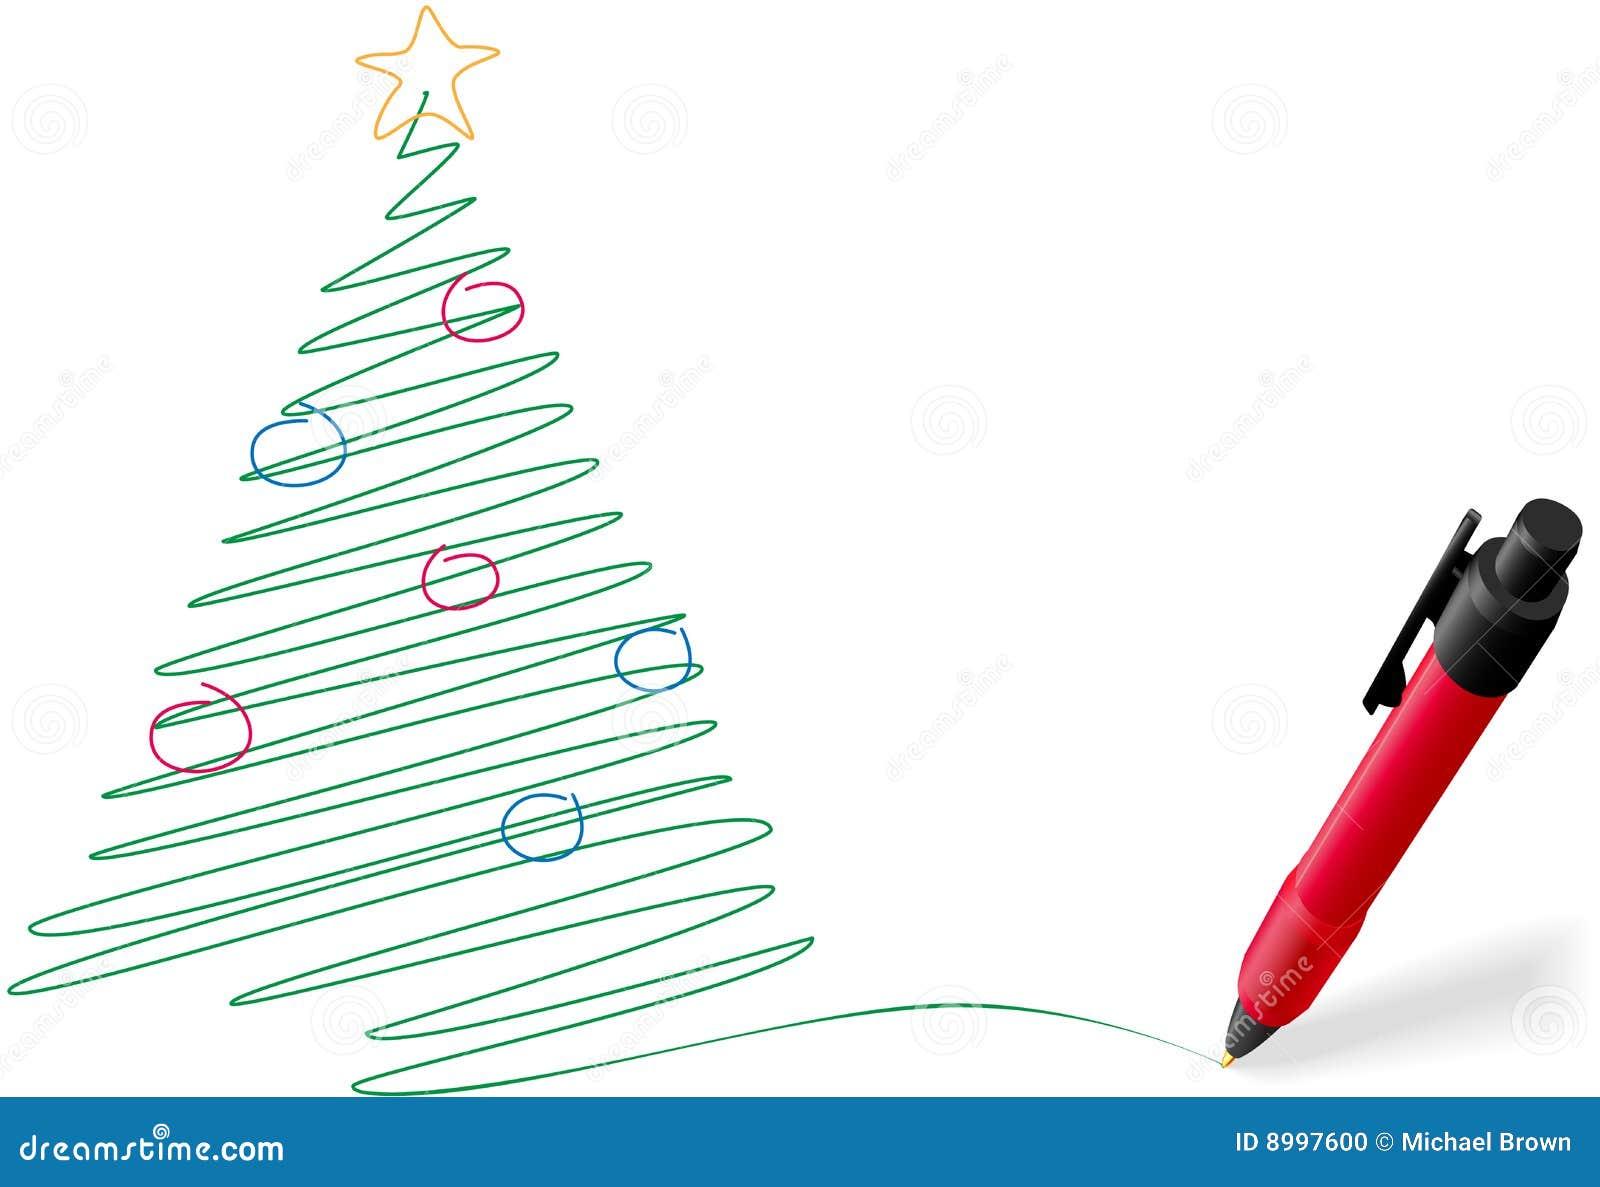 ... Pen Drawing Writing Merry Christmas Tree Stock Photo - Image: 8997600